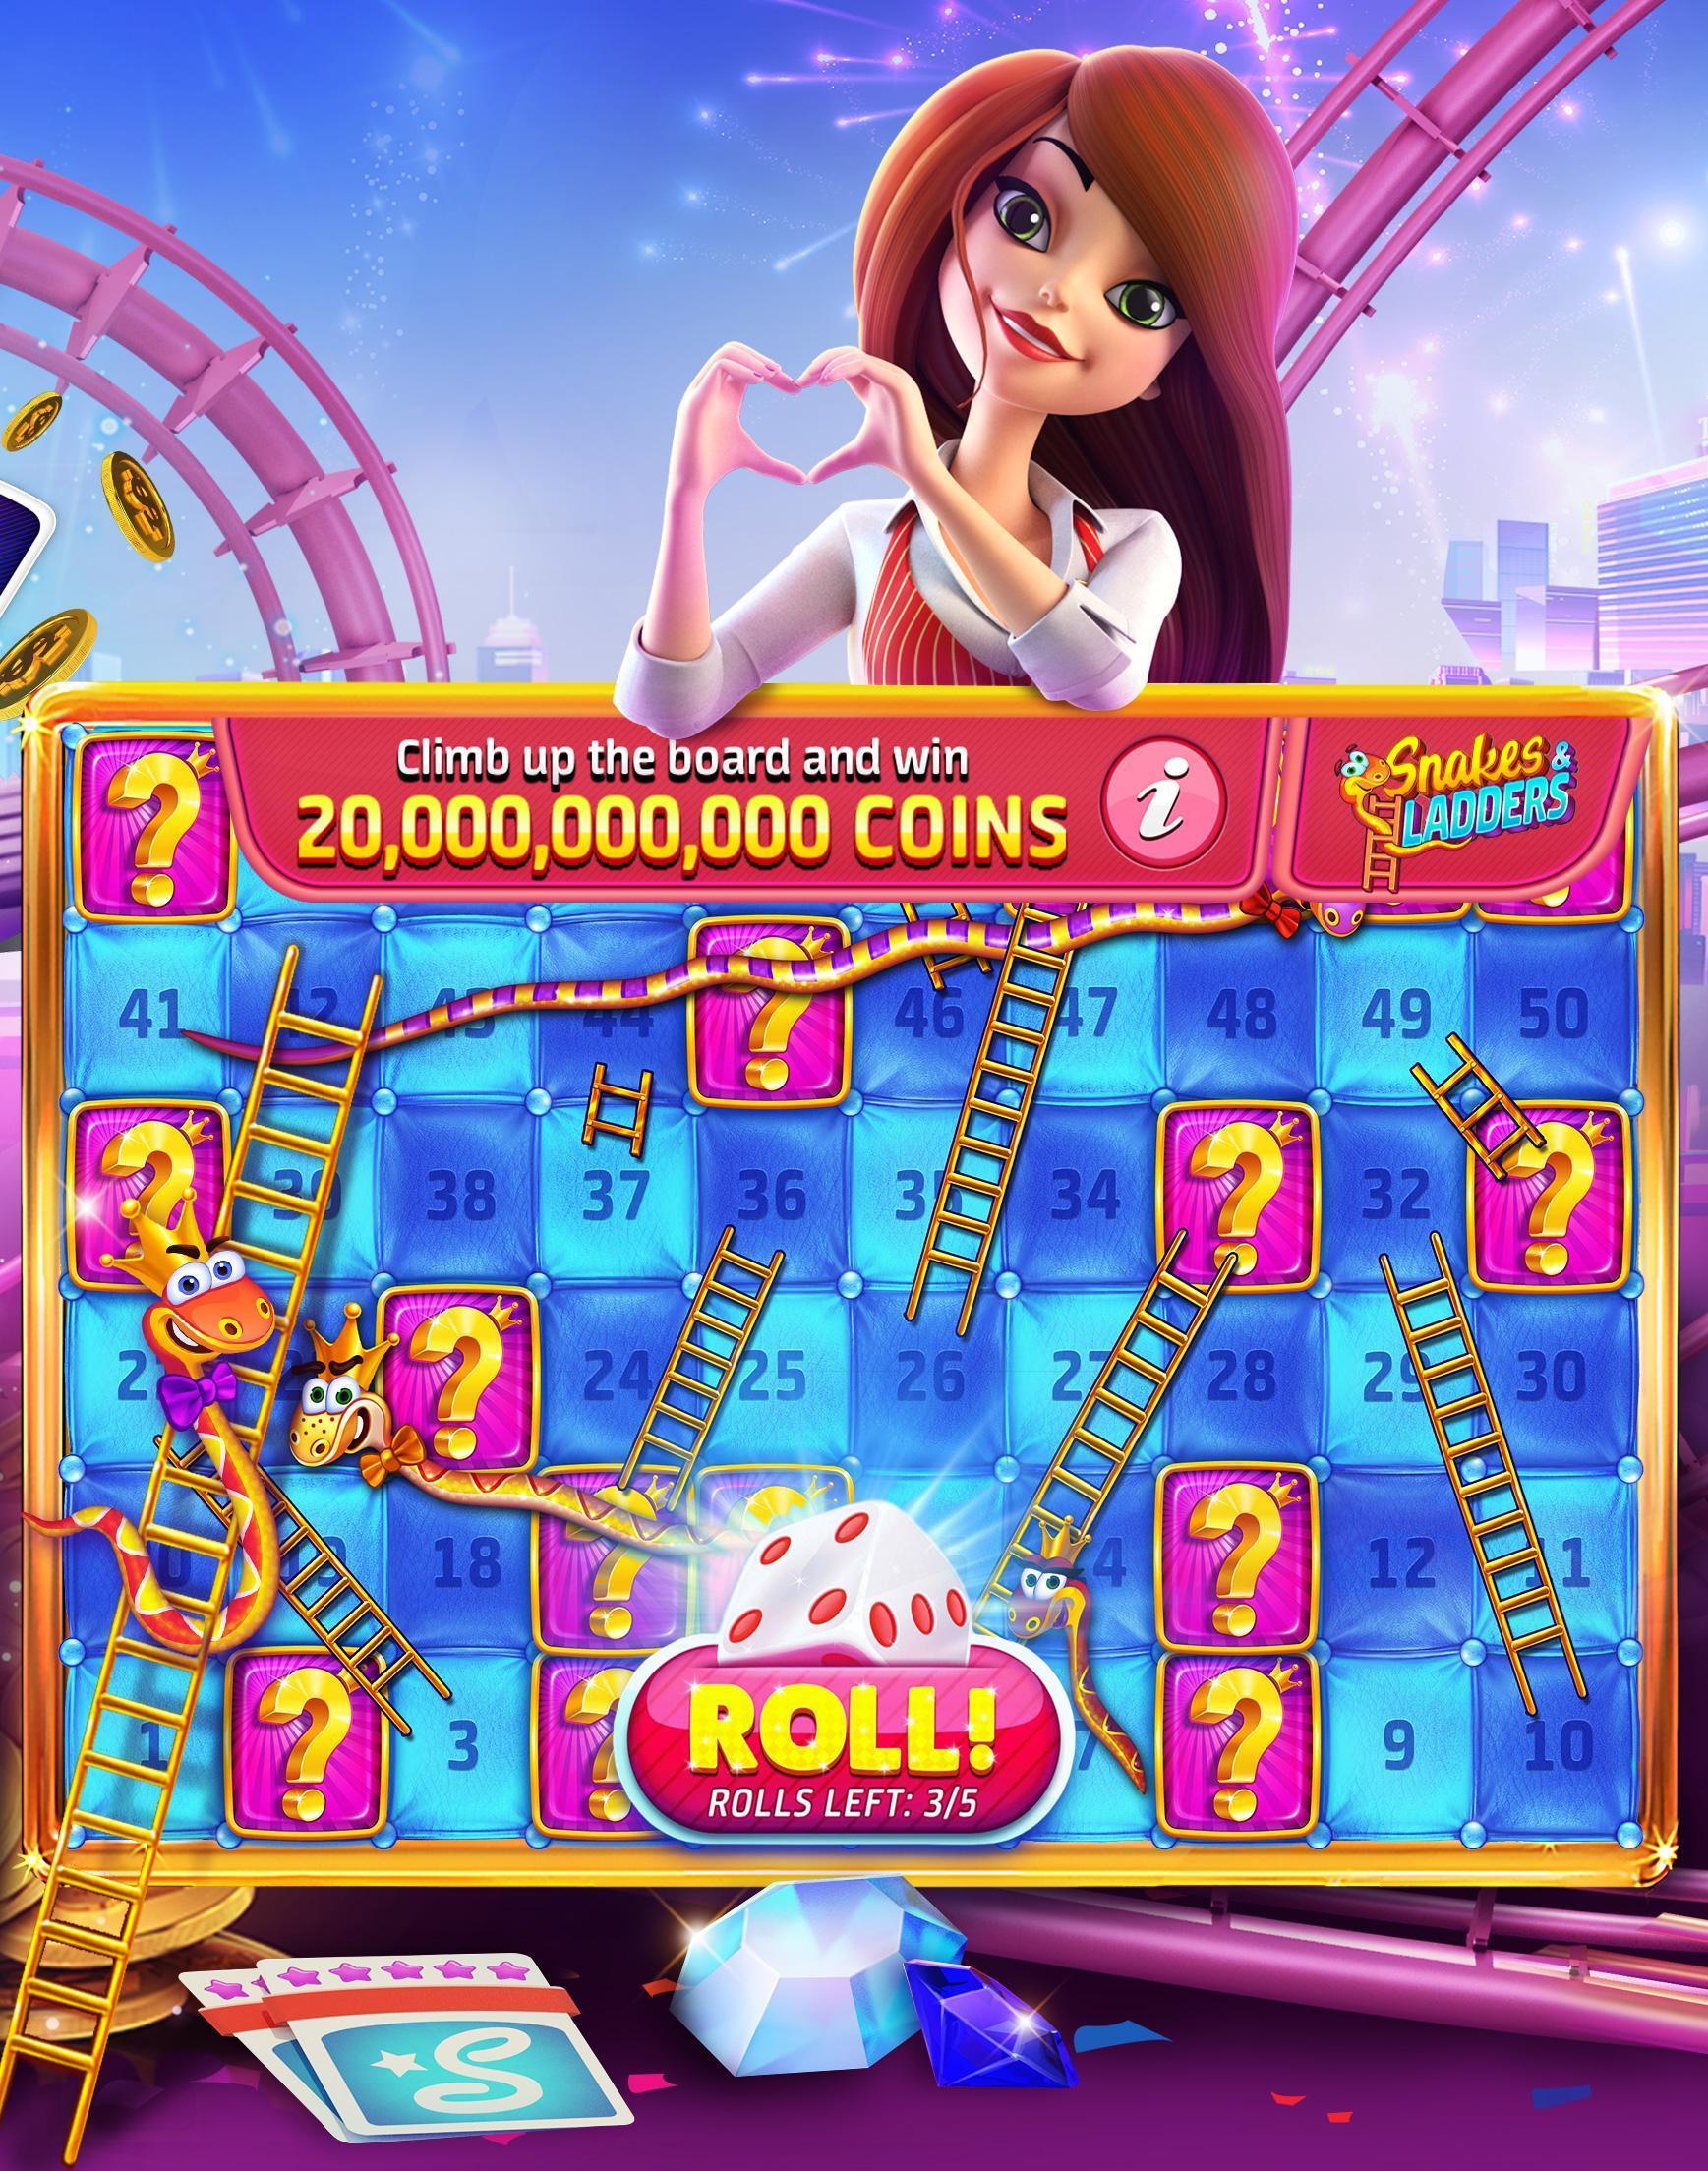 Download Casino Slot Machine Games